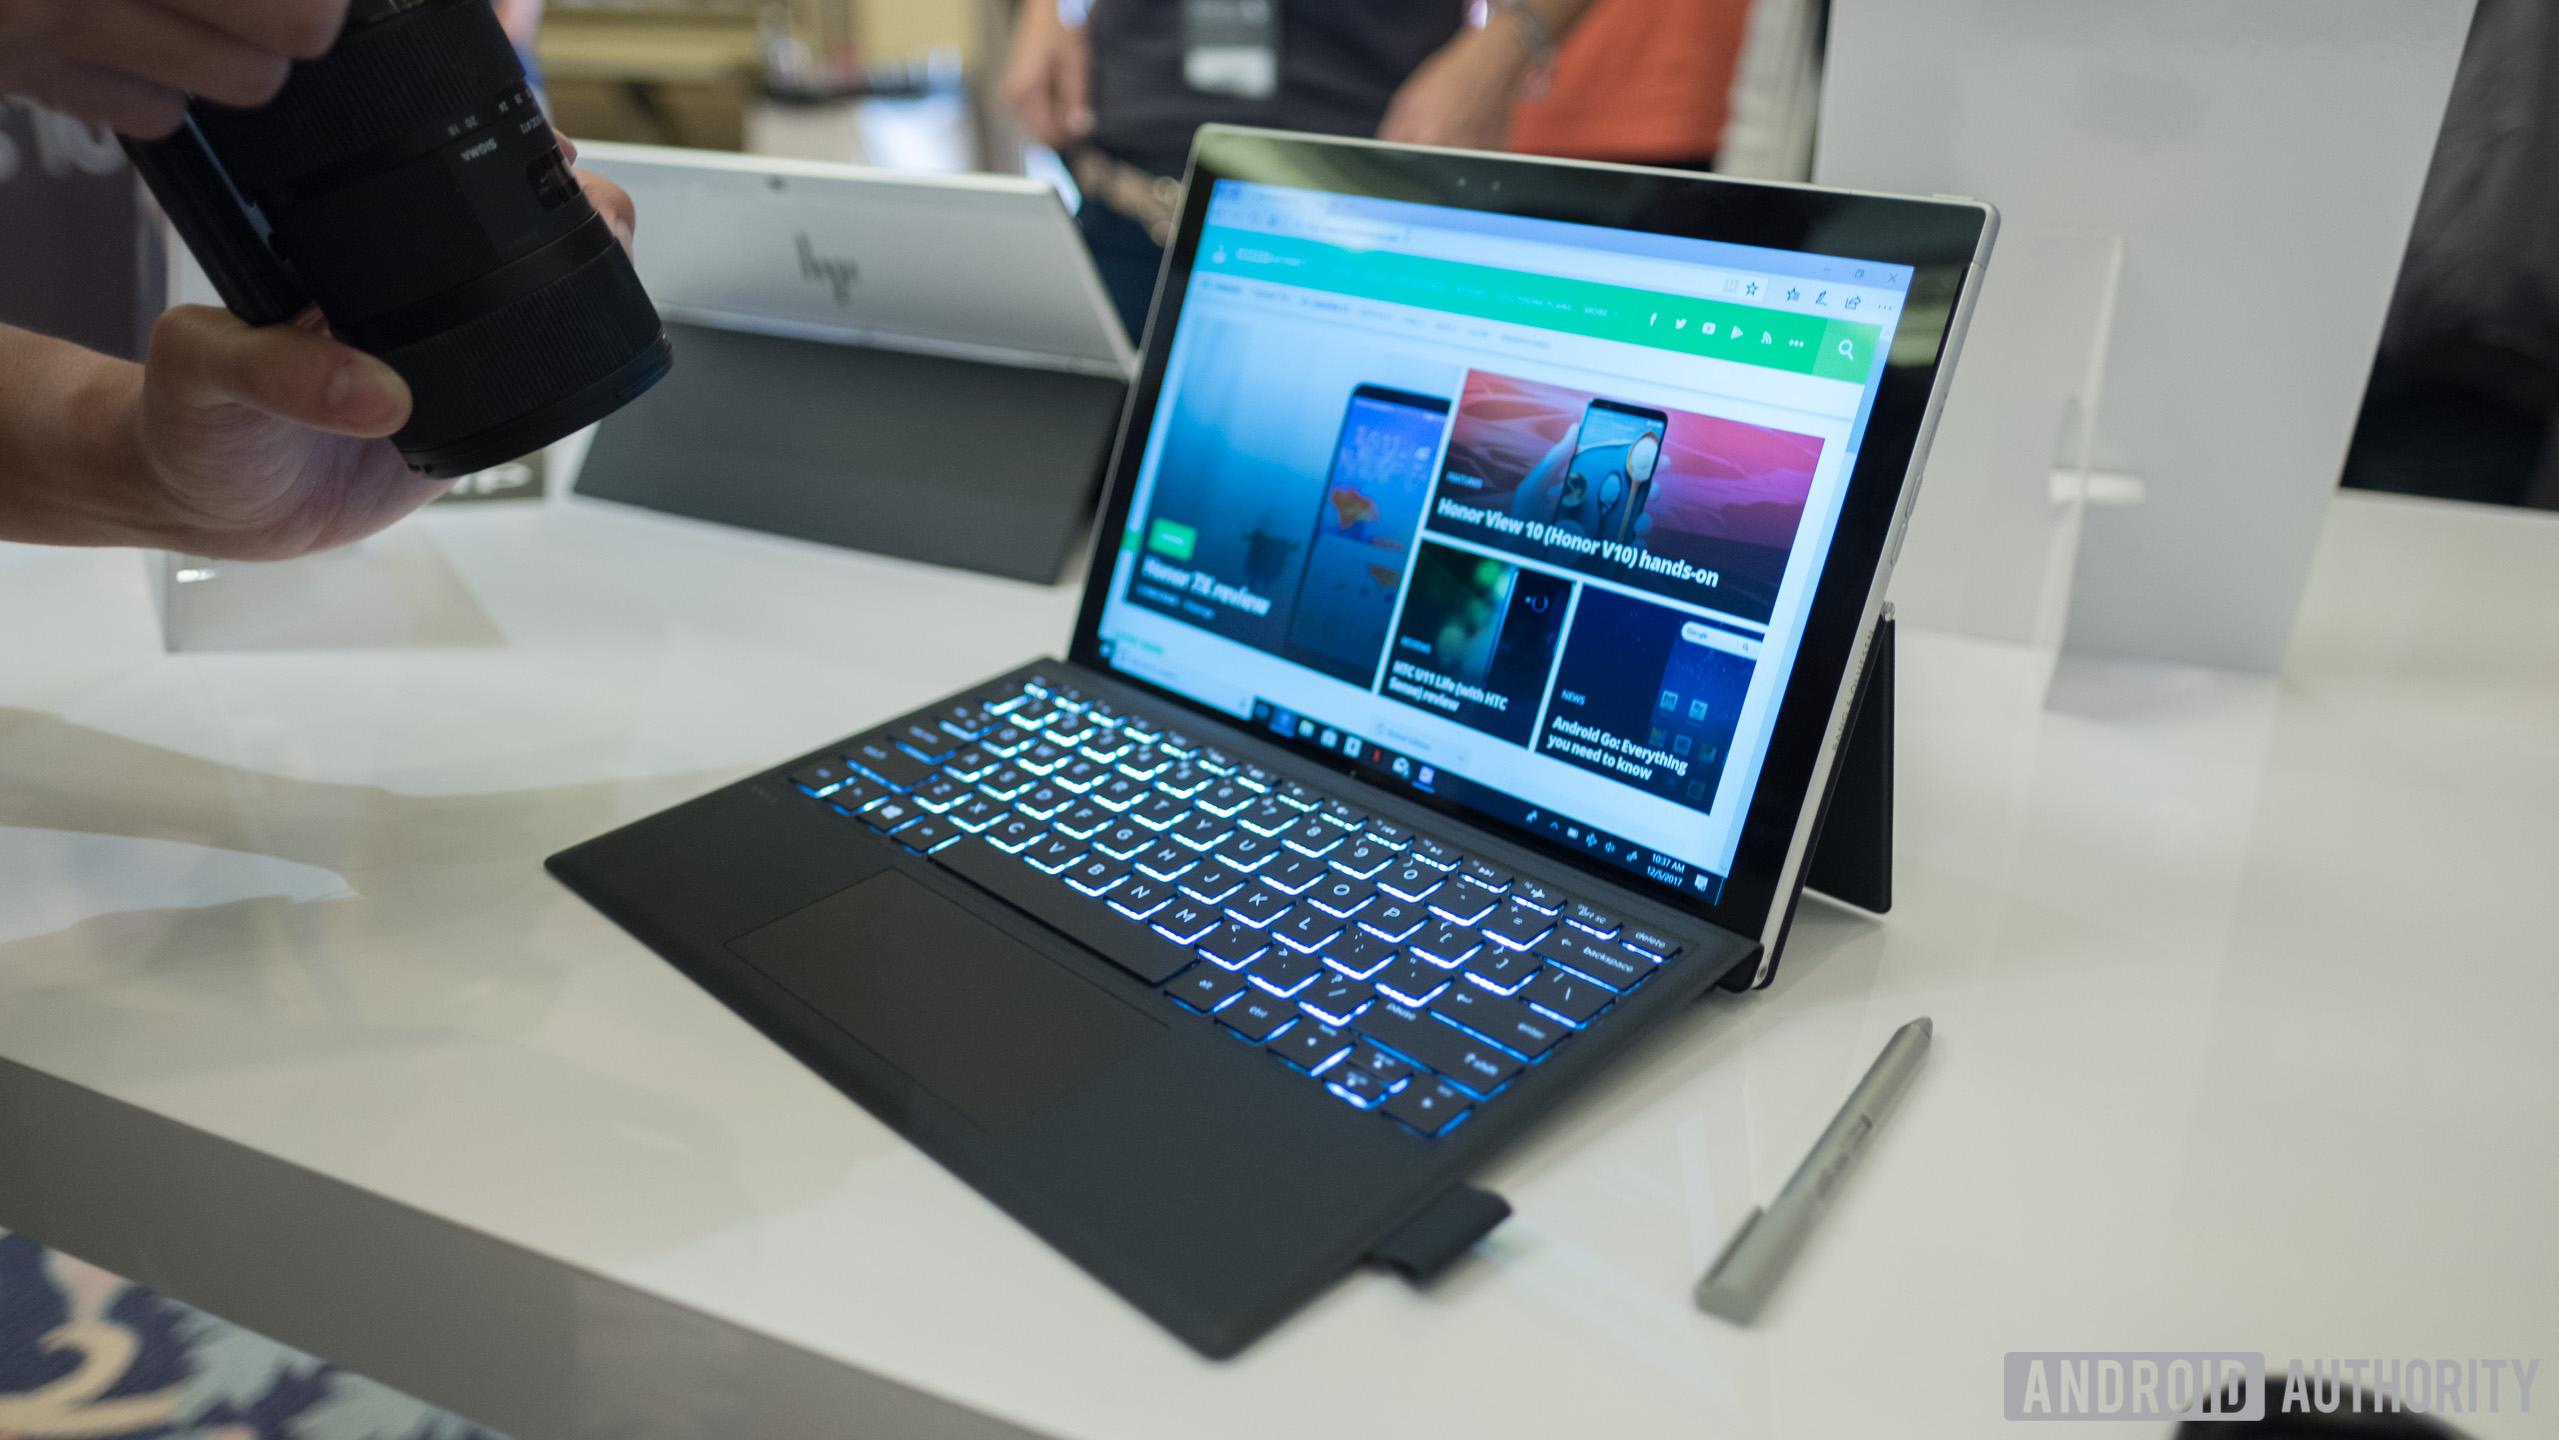 Snapdragon laptop